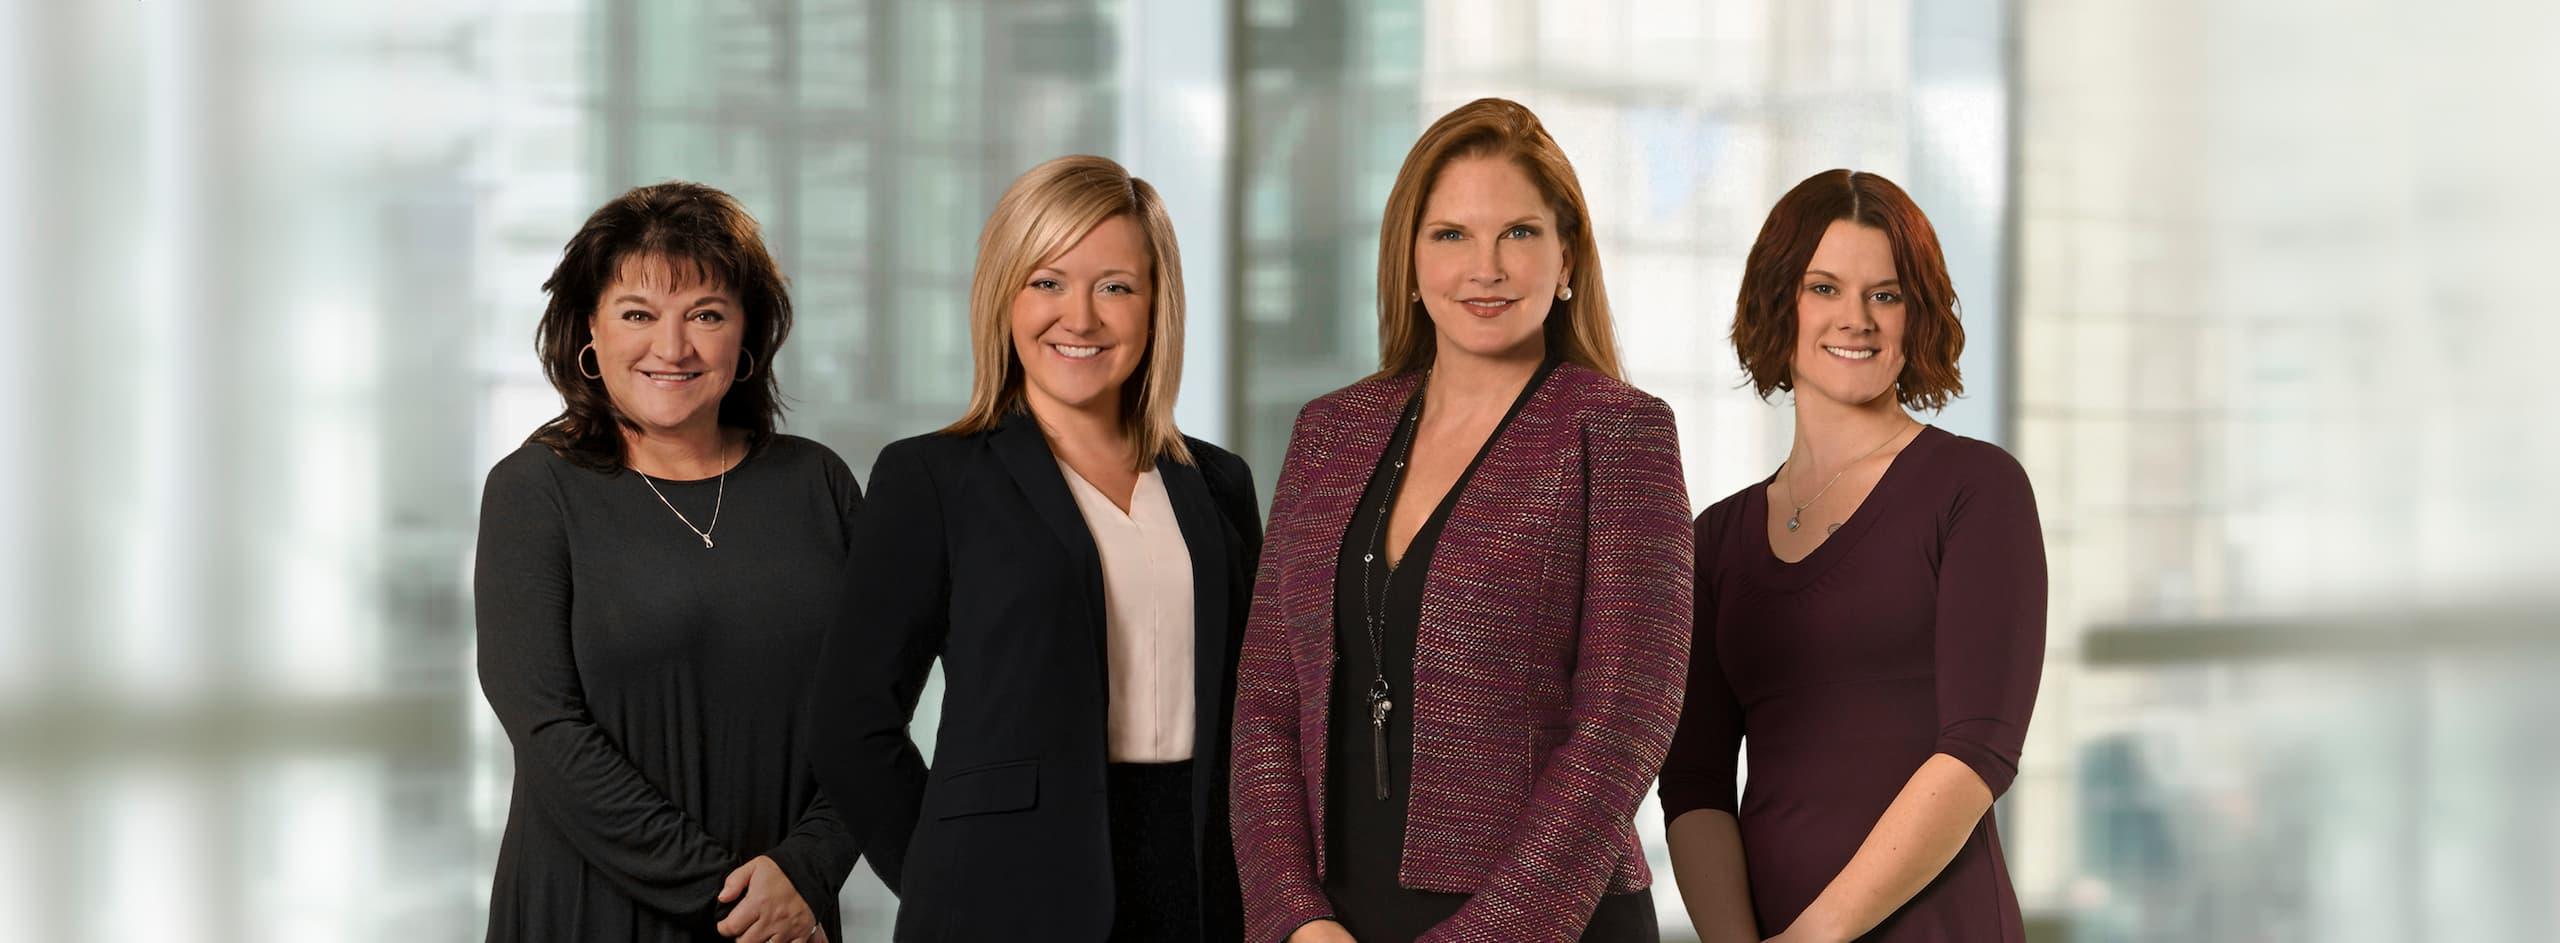 Wells Family Law Attorneys & Staff